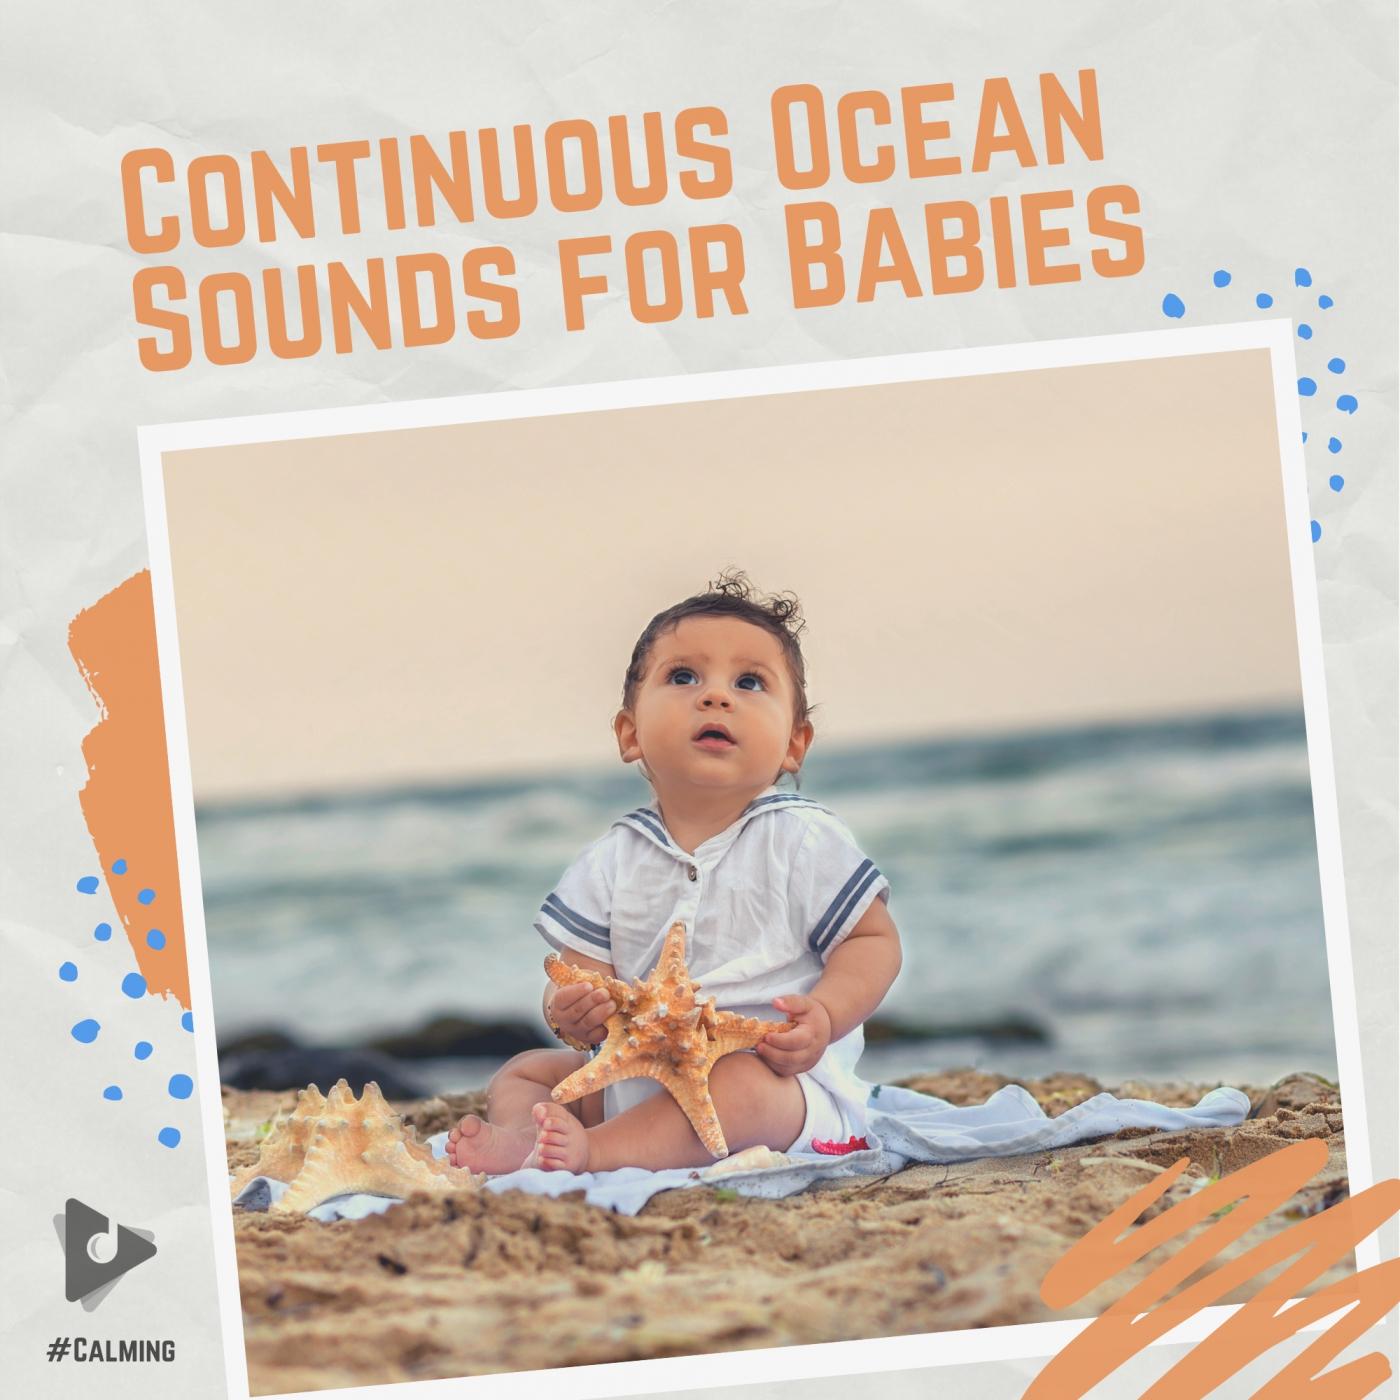 Continuous Ocean Sounds for Babies